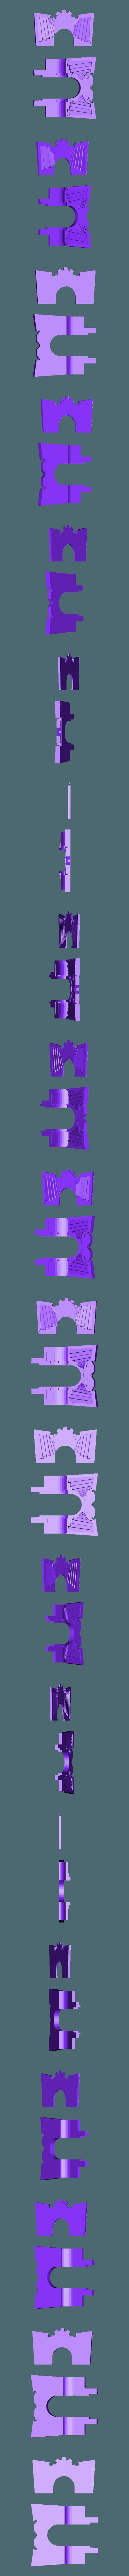 mk_d-4lt_pc_shields.stl Download free STL file Big Plasma Cannon Turret • 3D printing design, JtStrait72